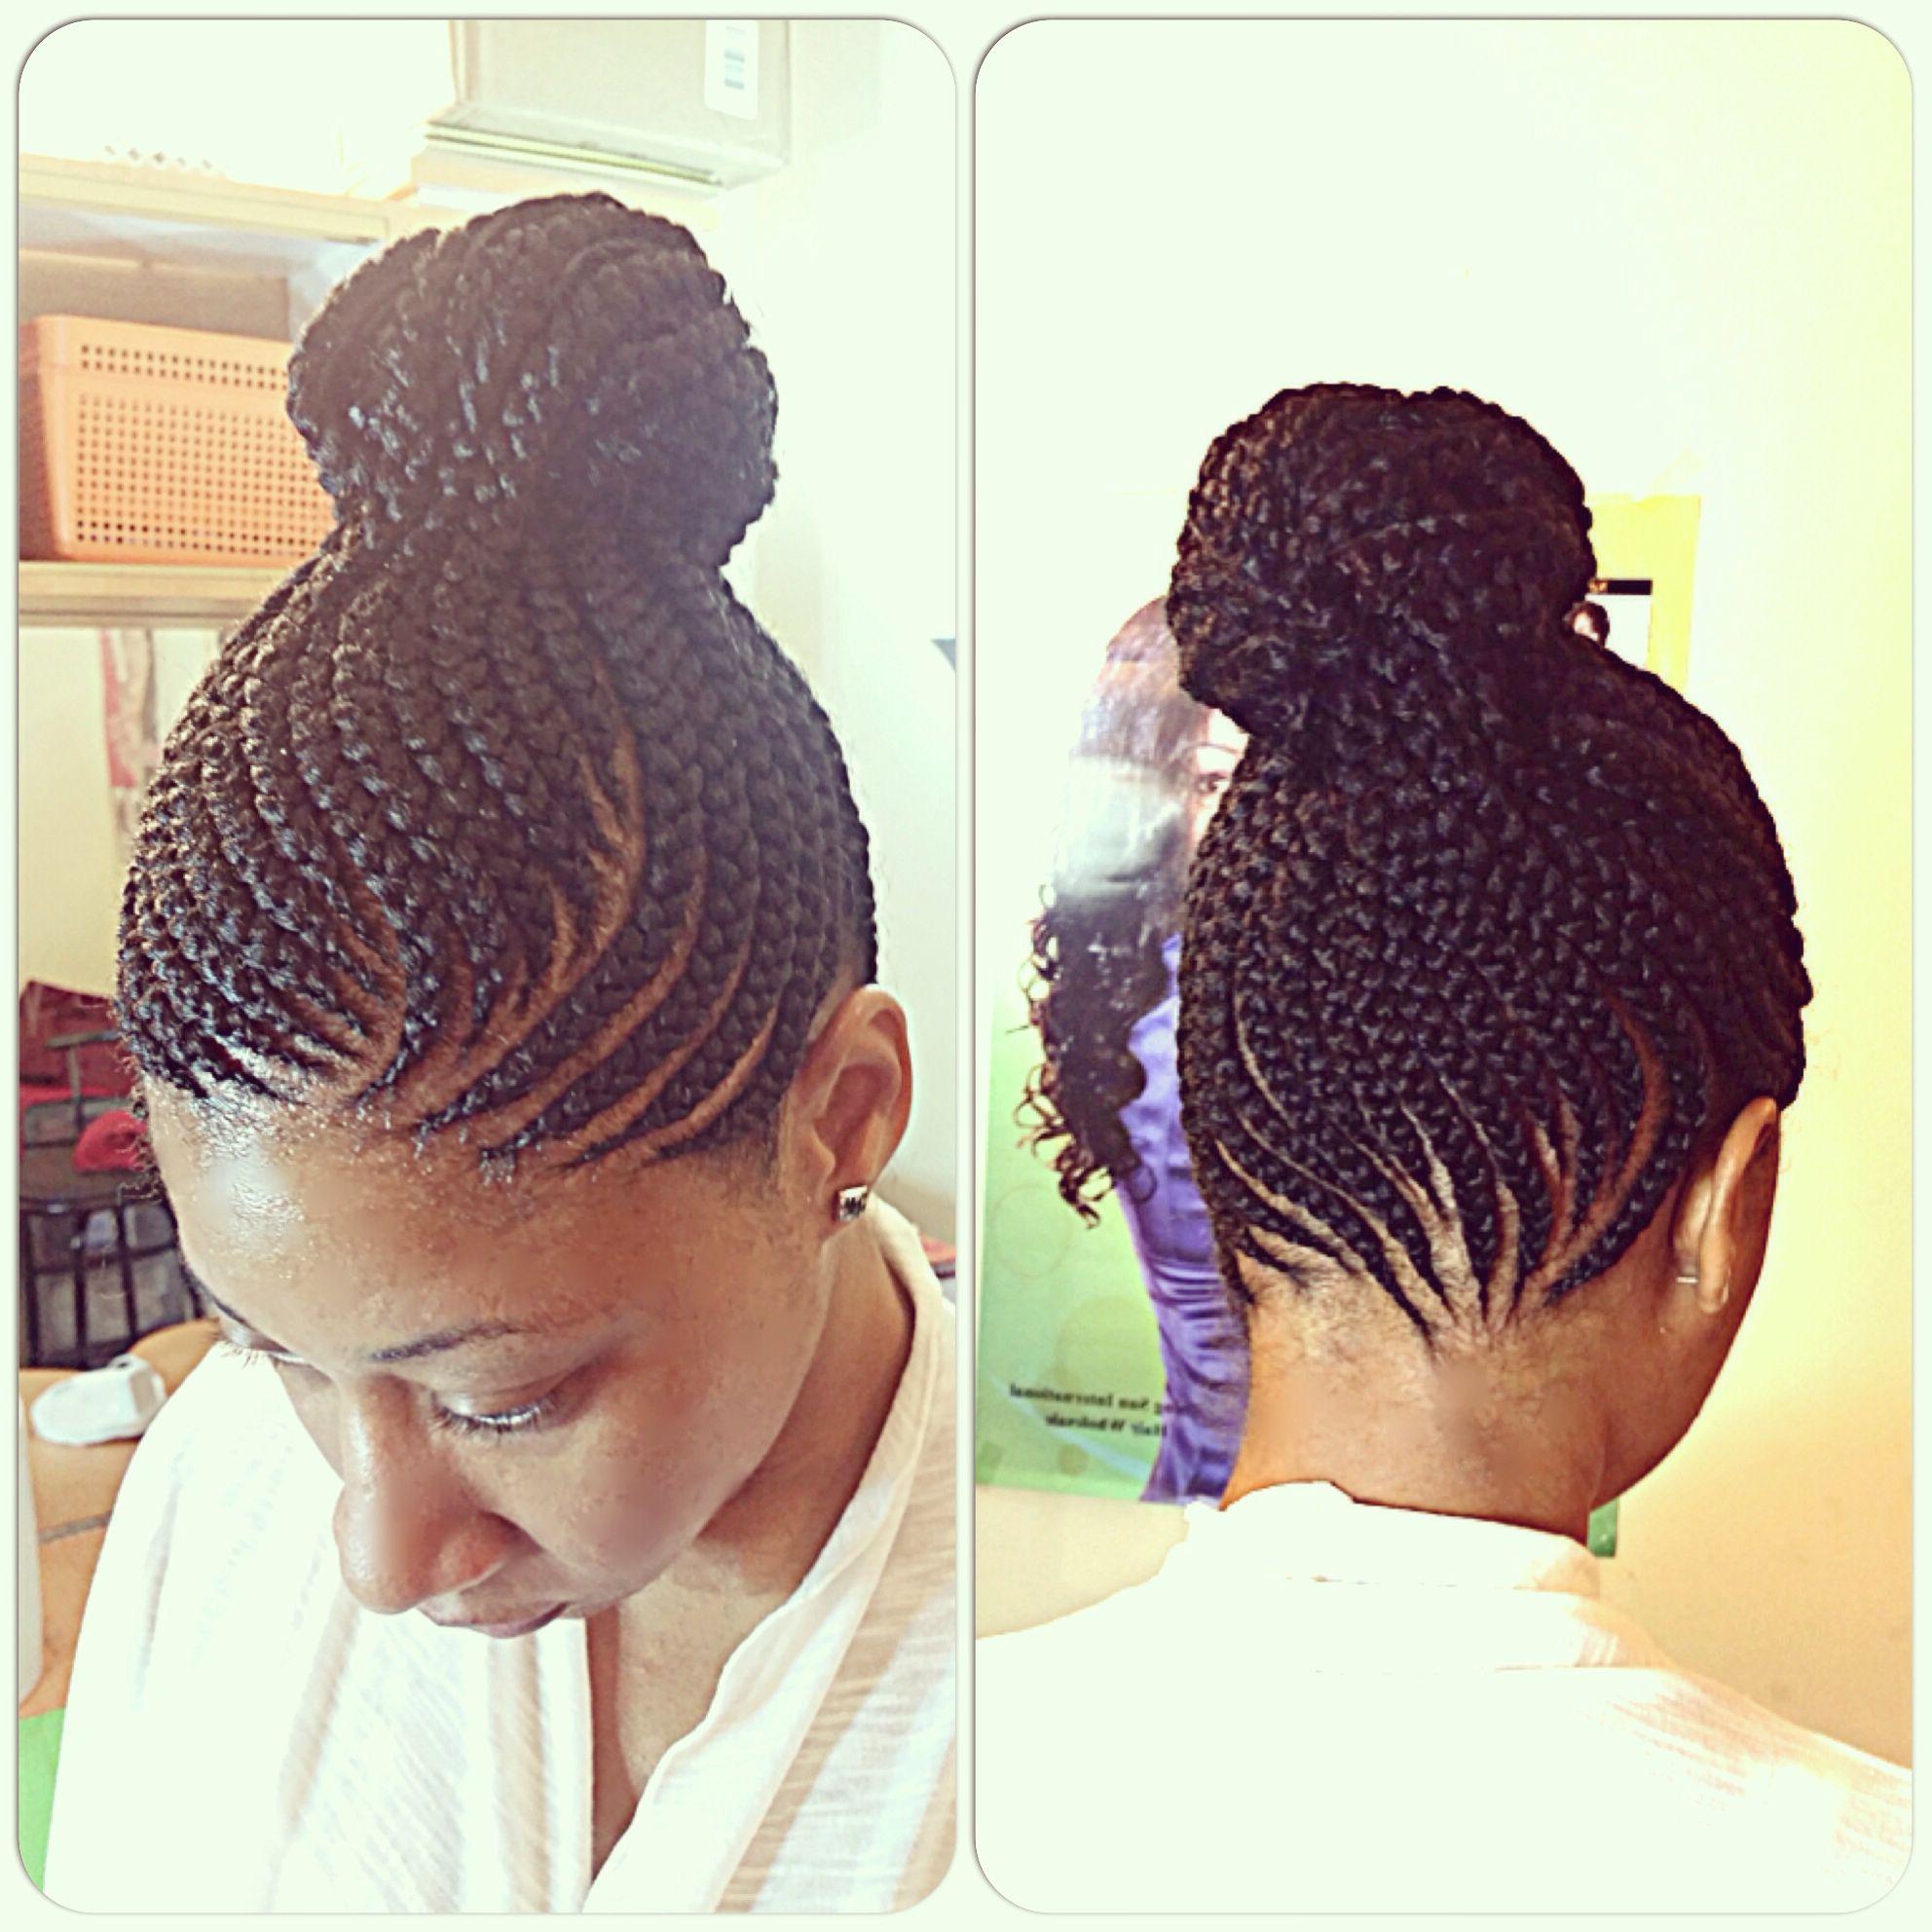 Trendy Cornrows Tight Bun Under Braid Hairstyles Regarding Feeding Cornrows, Cornrows , Braids , Braiding, Braids Into (View 19 of 20)